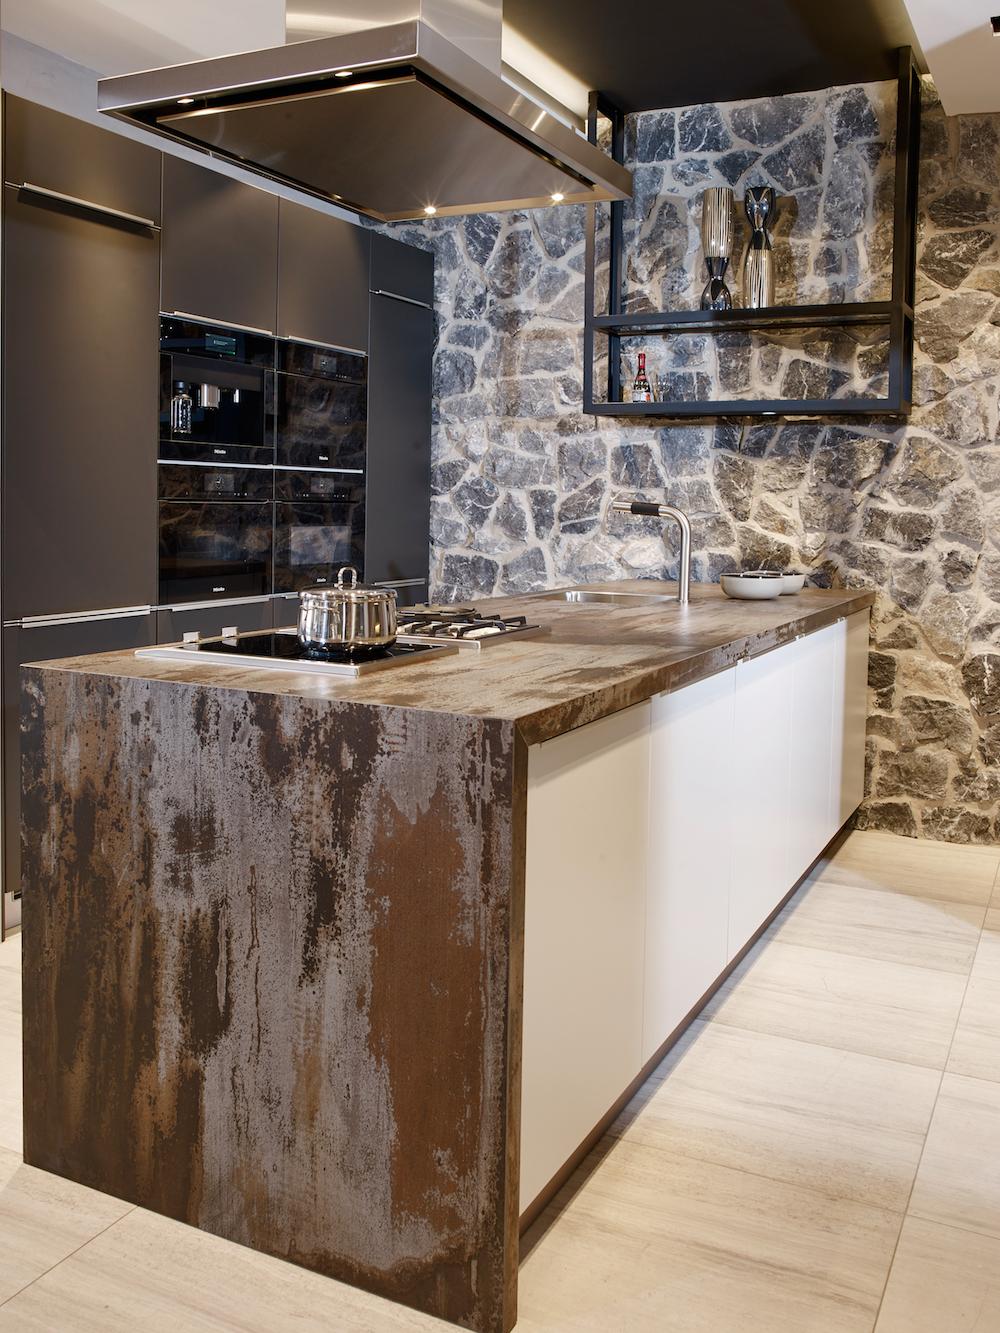 Duurzame werkbladen in moderne keuken